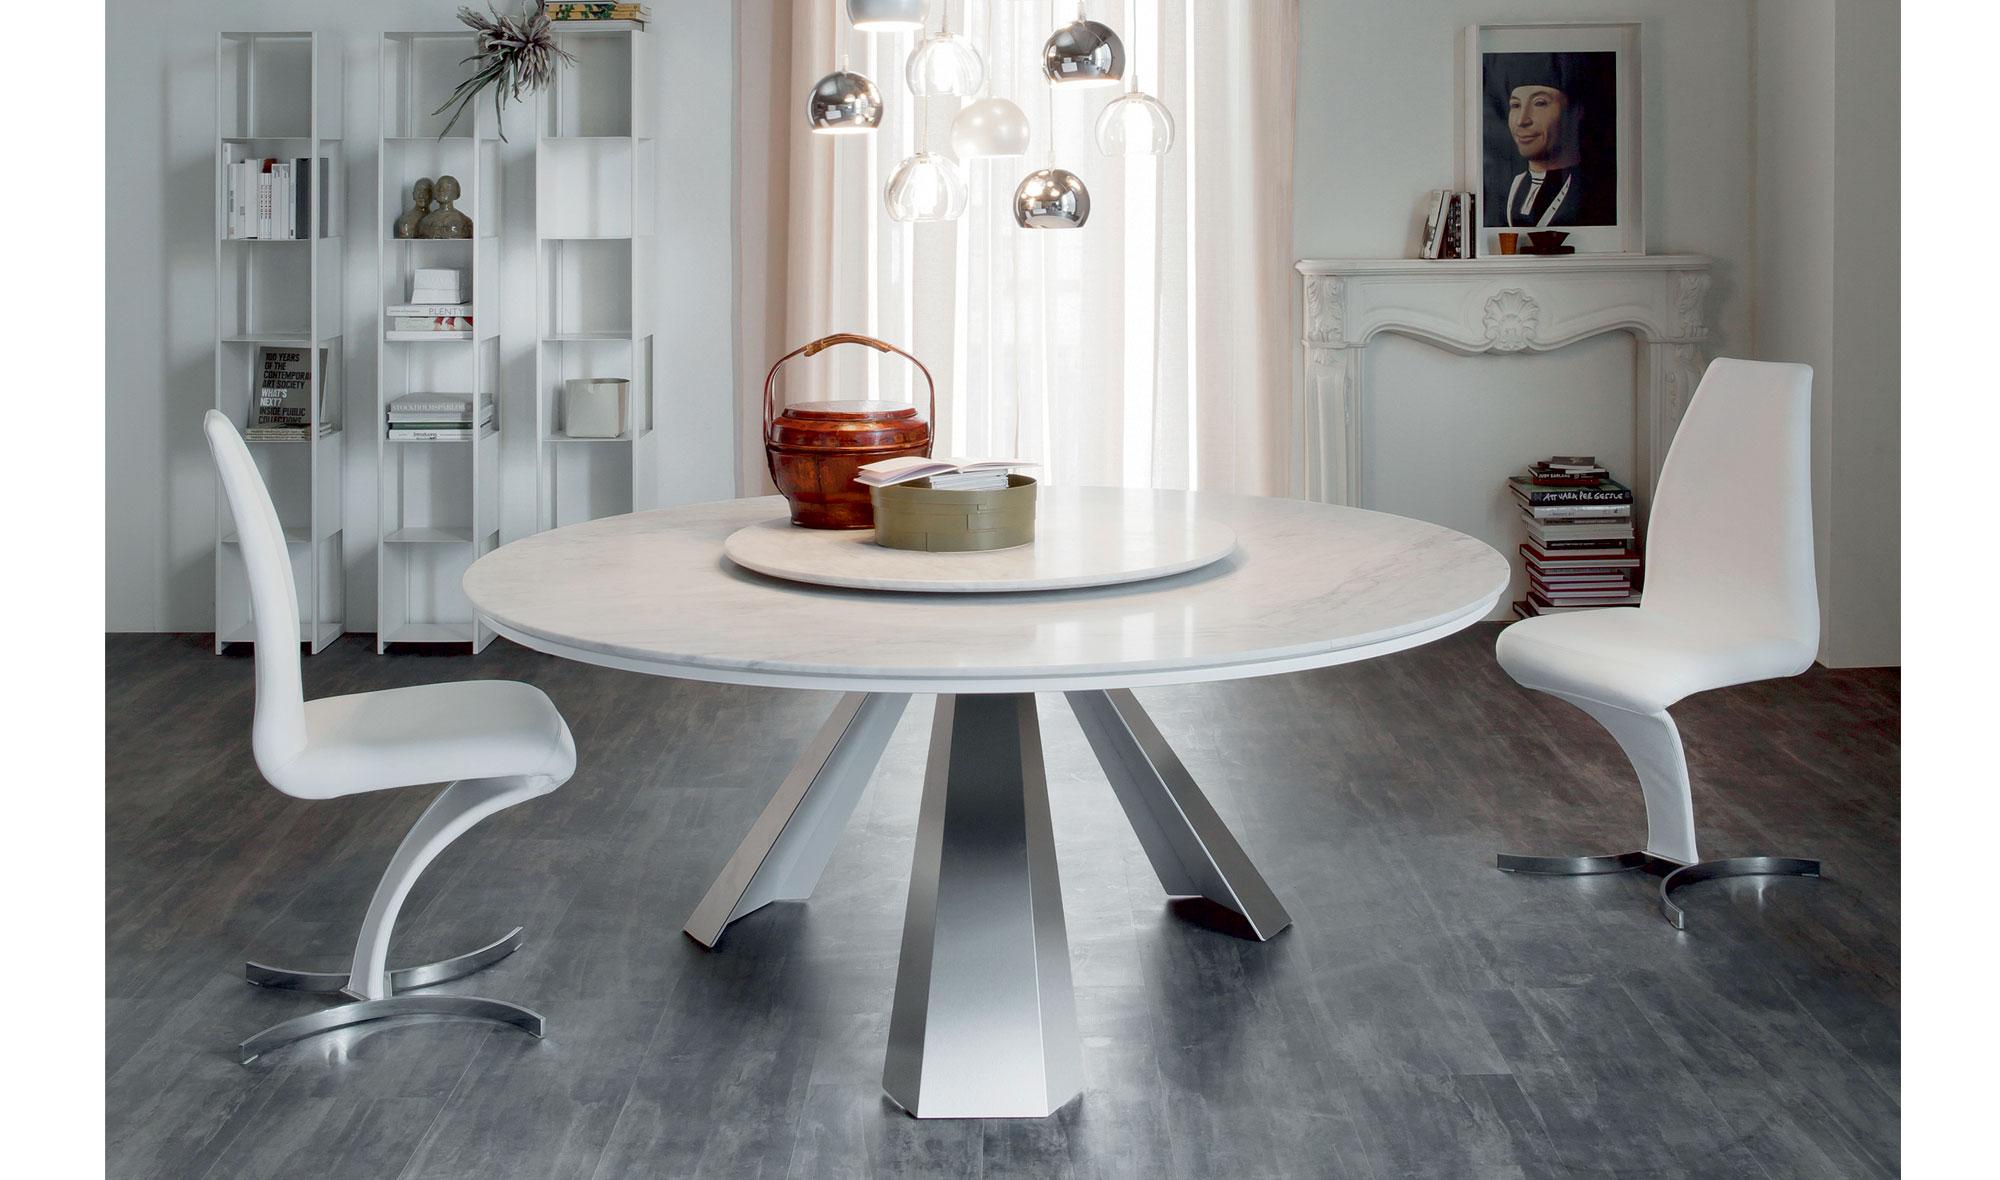 mesa de comedor redonda moderna eliot cattelan en